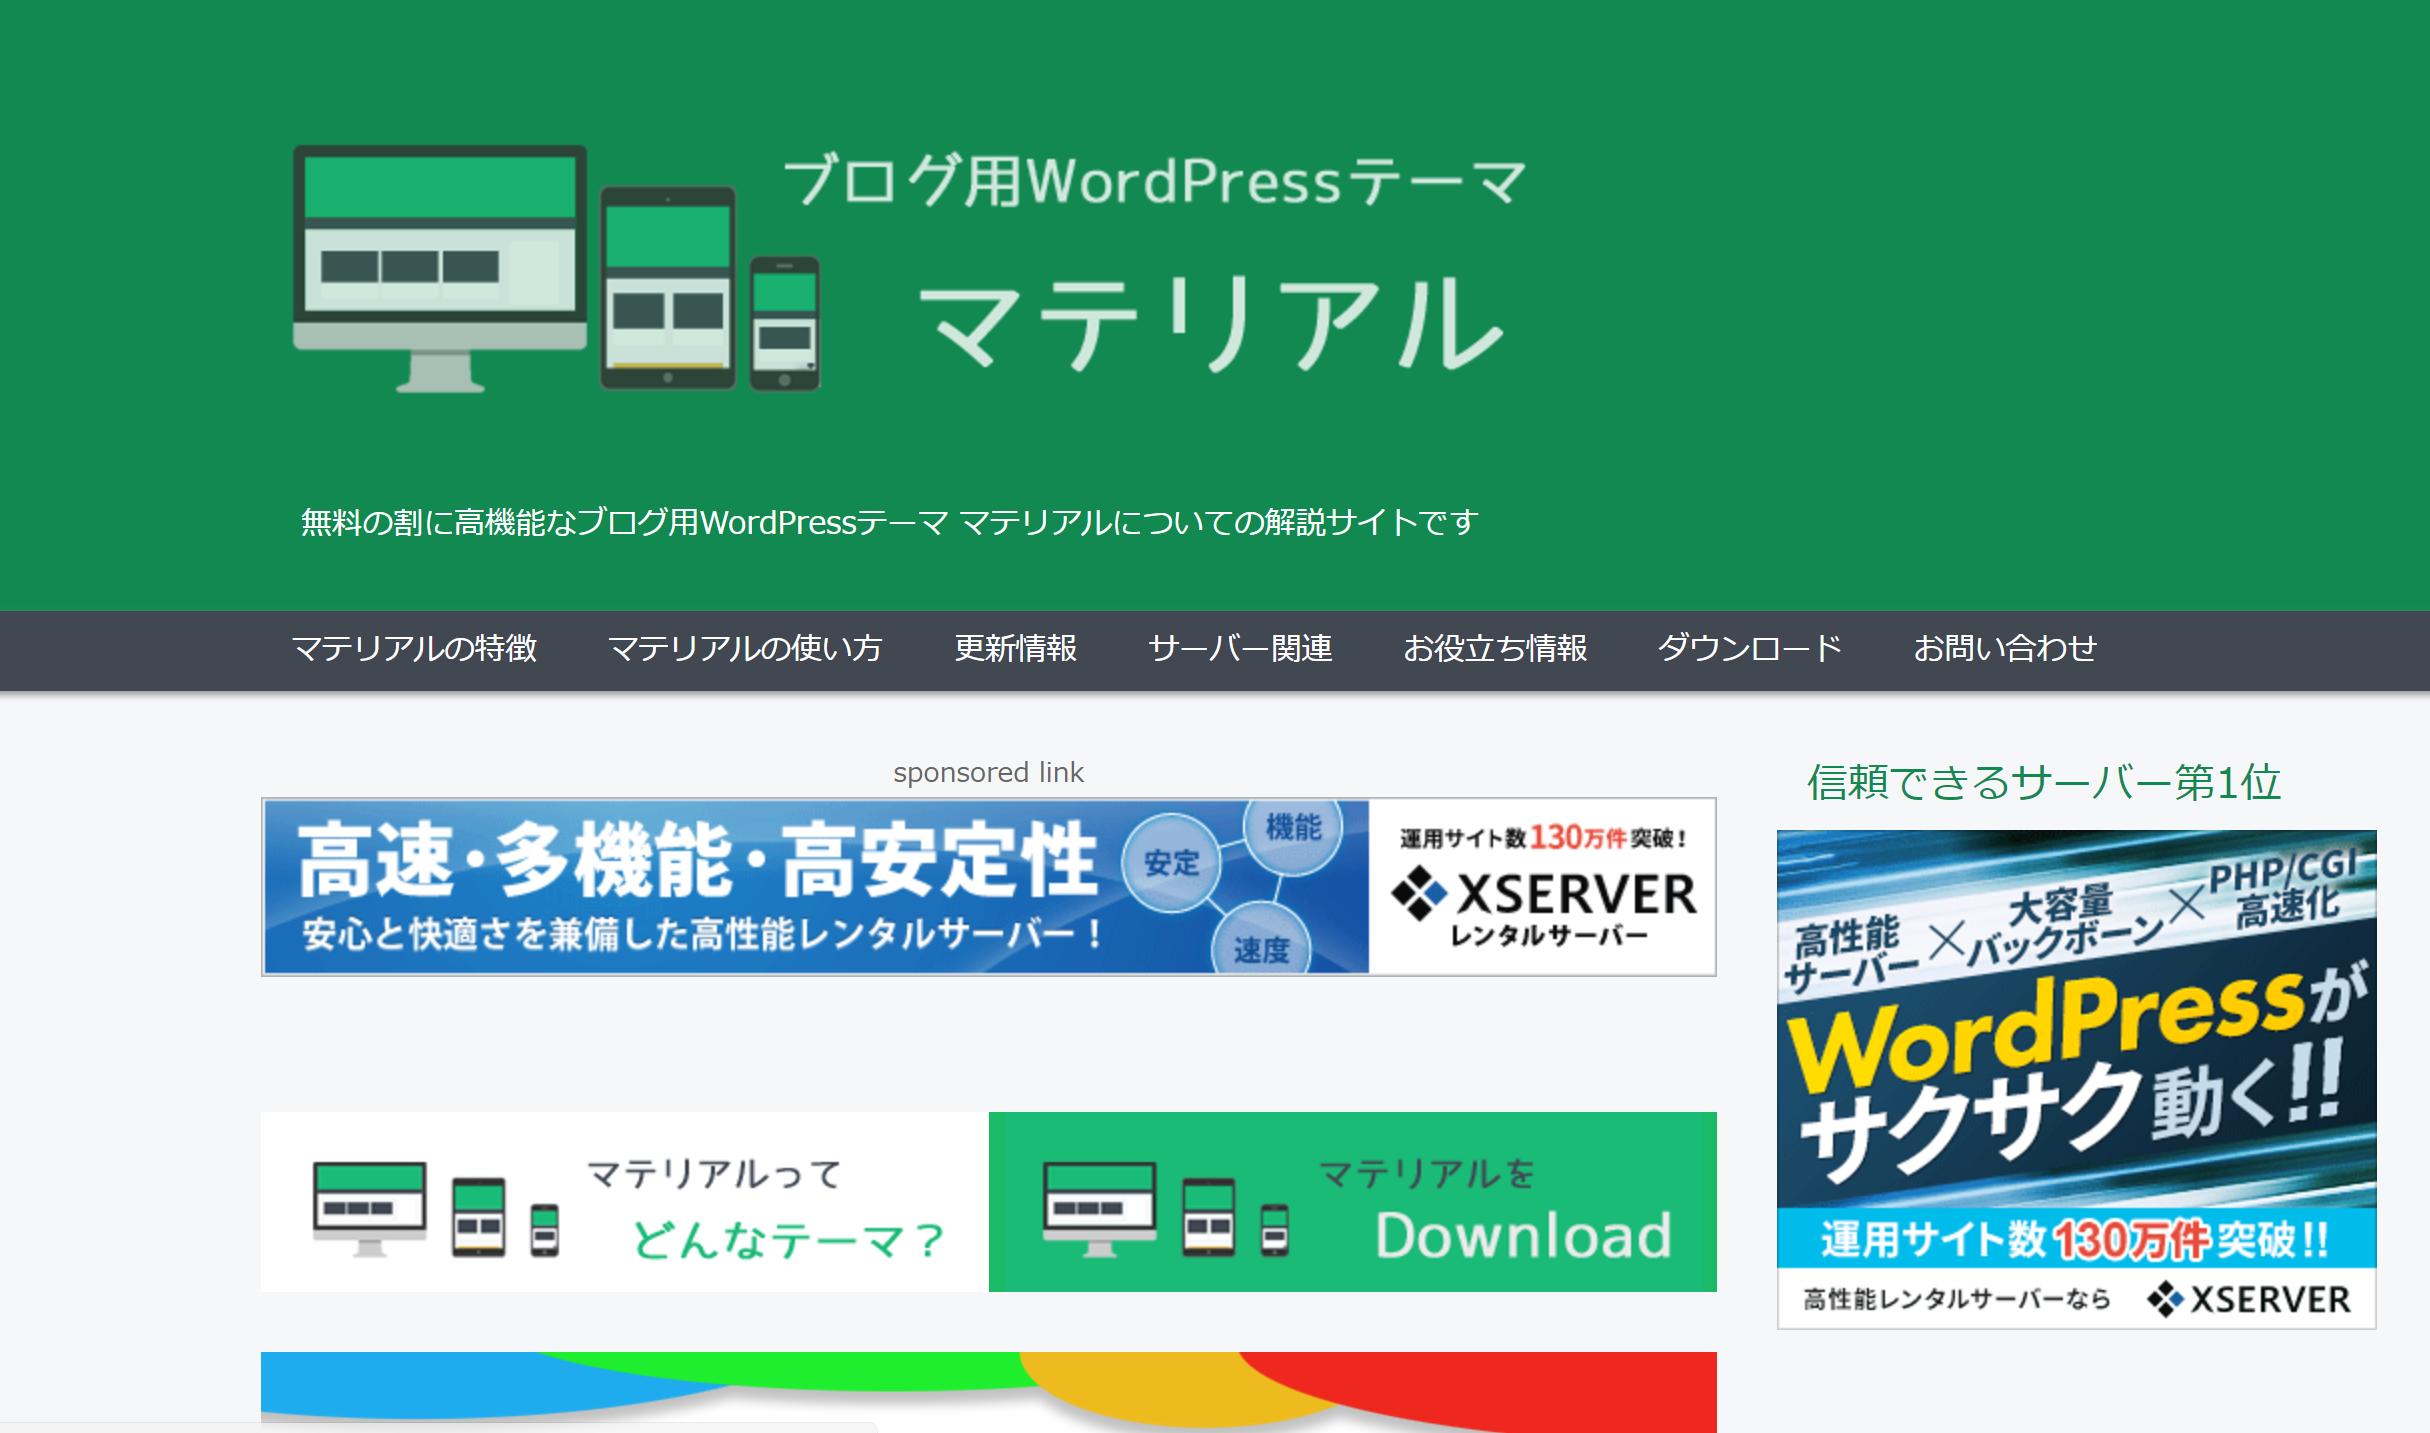 material - Wordpressで会員サイトを作るプラグイン5選とおすすめテーマ3選